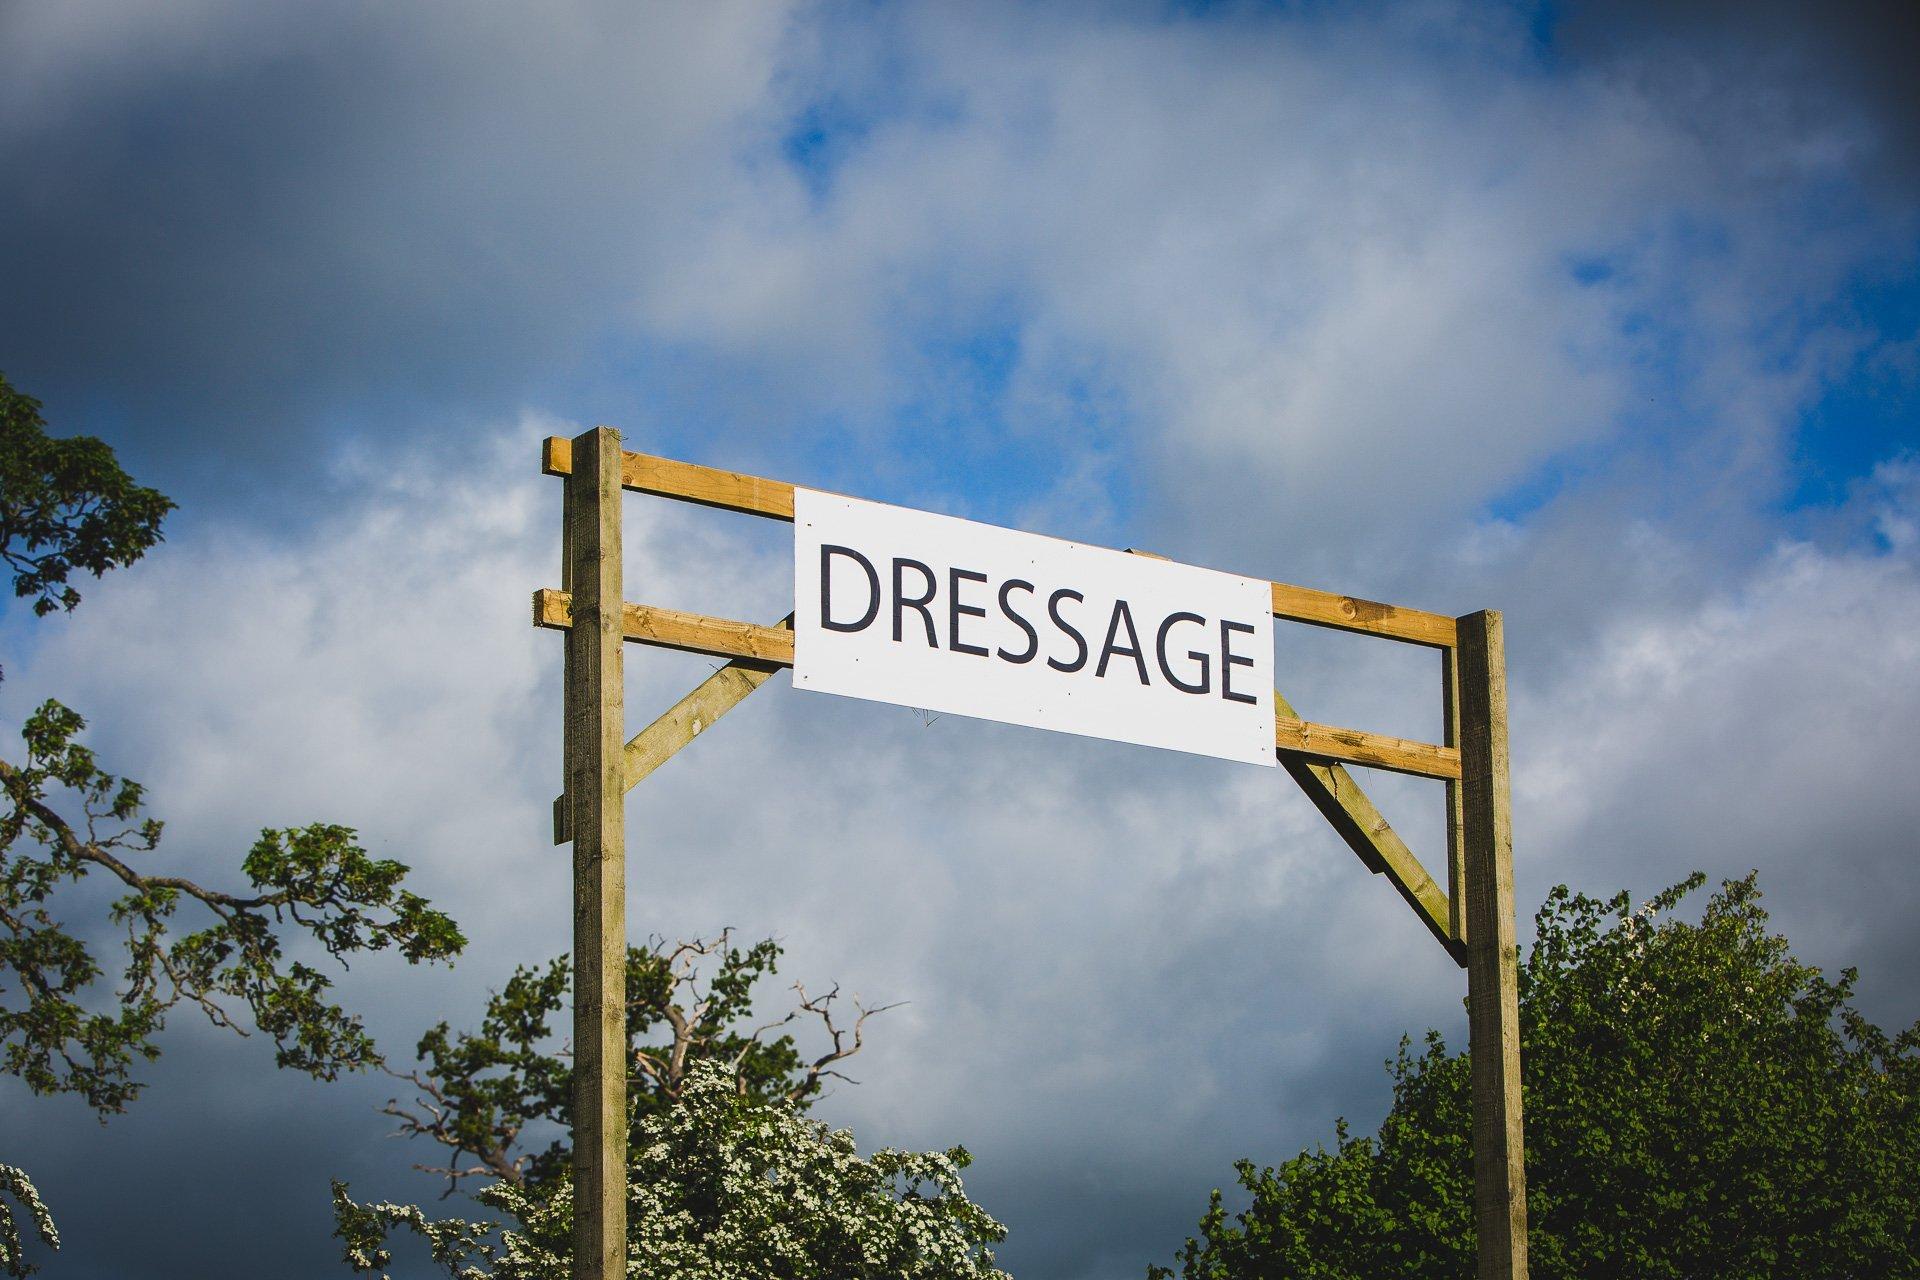 dressage at Llanymynech horse trials